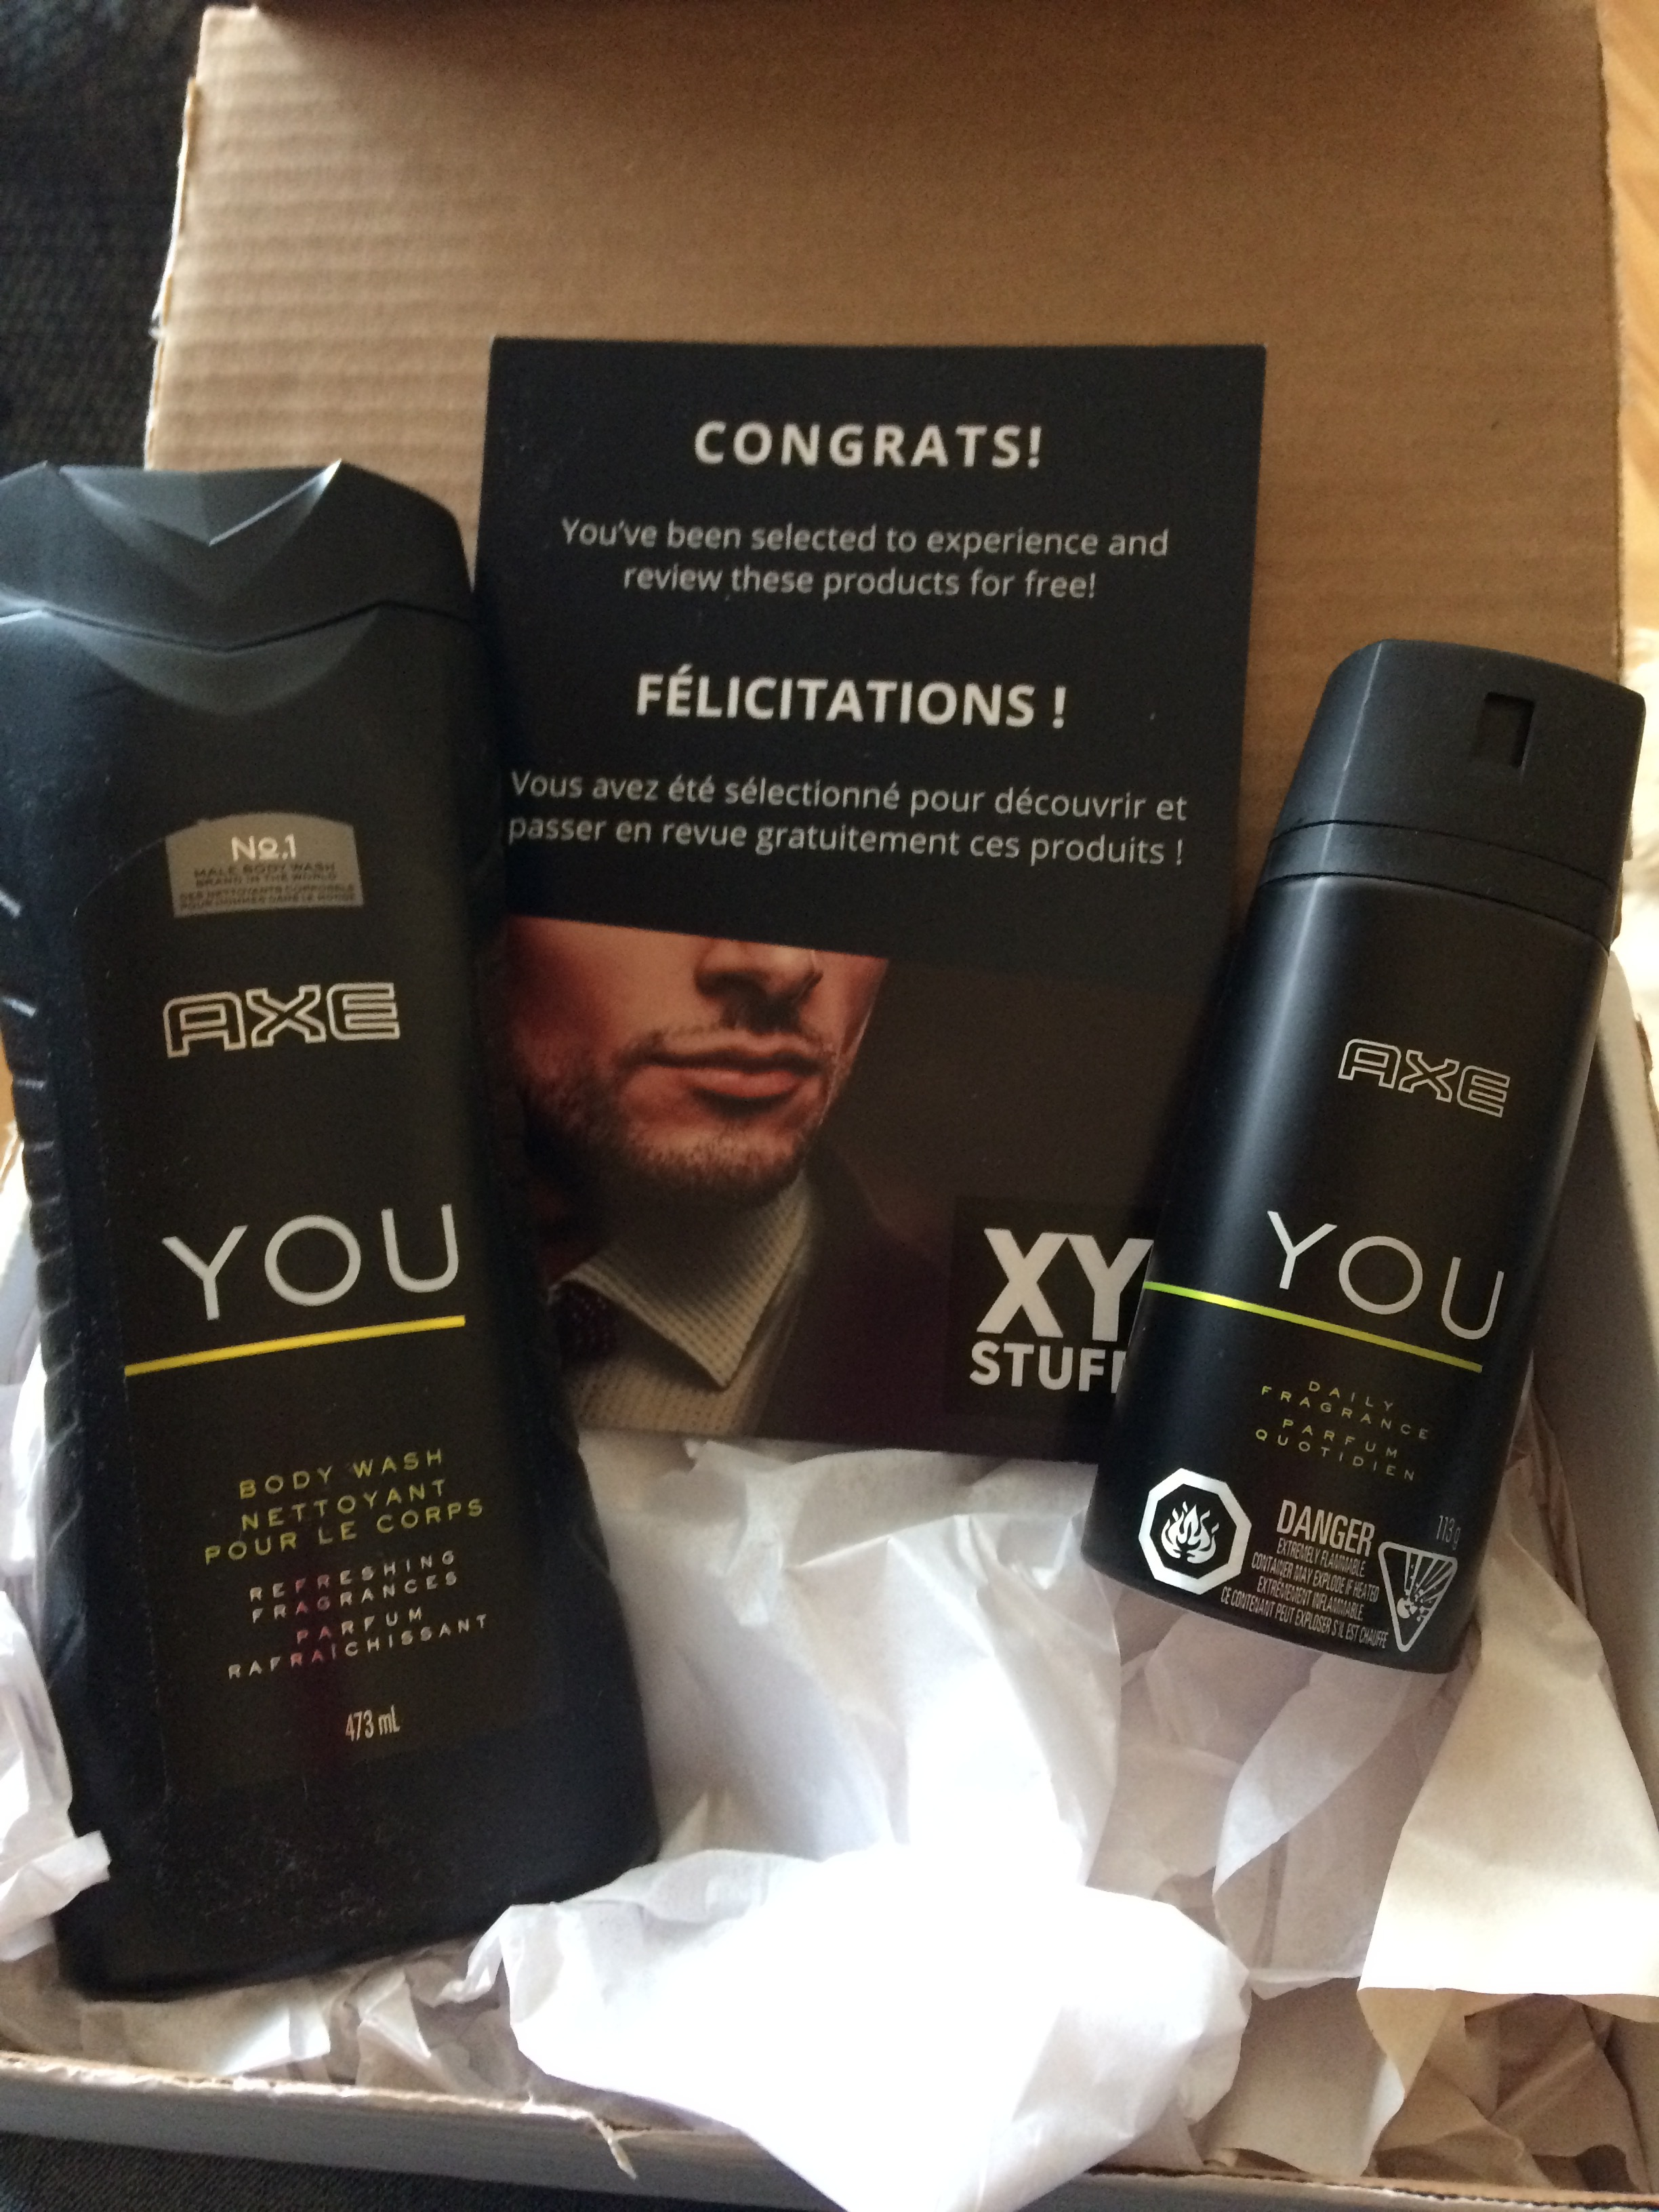 Axe You Body Spray Reviews In Sprays Xy Stuff Page 4 Deodorant Bodyspray Gold Temptation 150ml Twin Pack Image Gallery